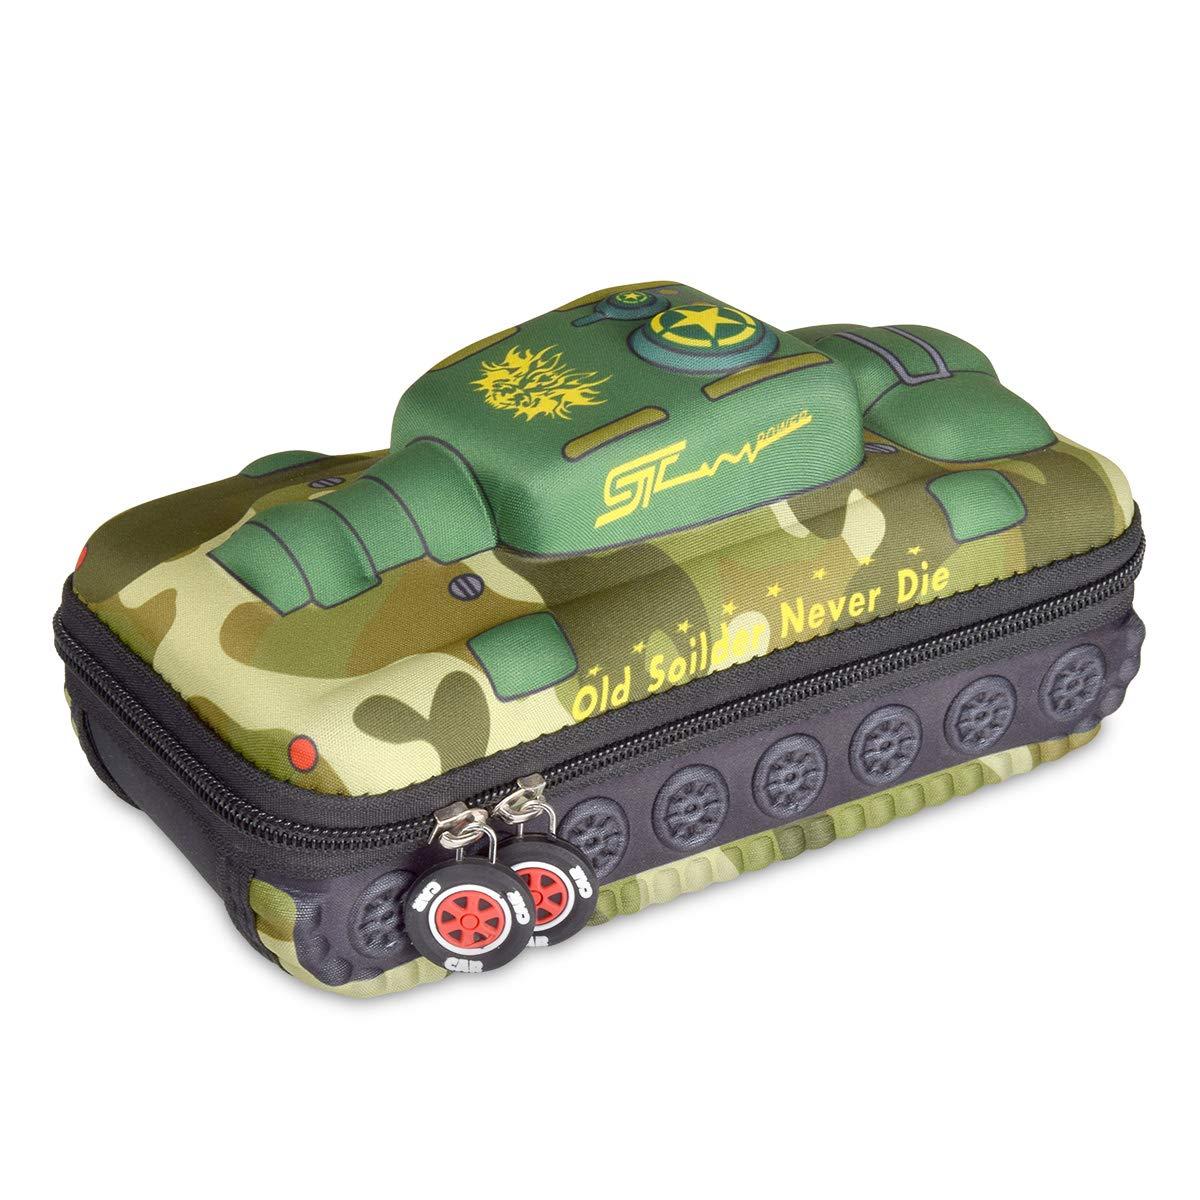 Amazon.com: Creative Camouflage Tanks - Caja para lápices de ...